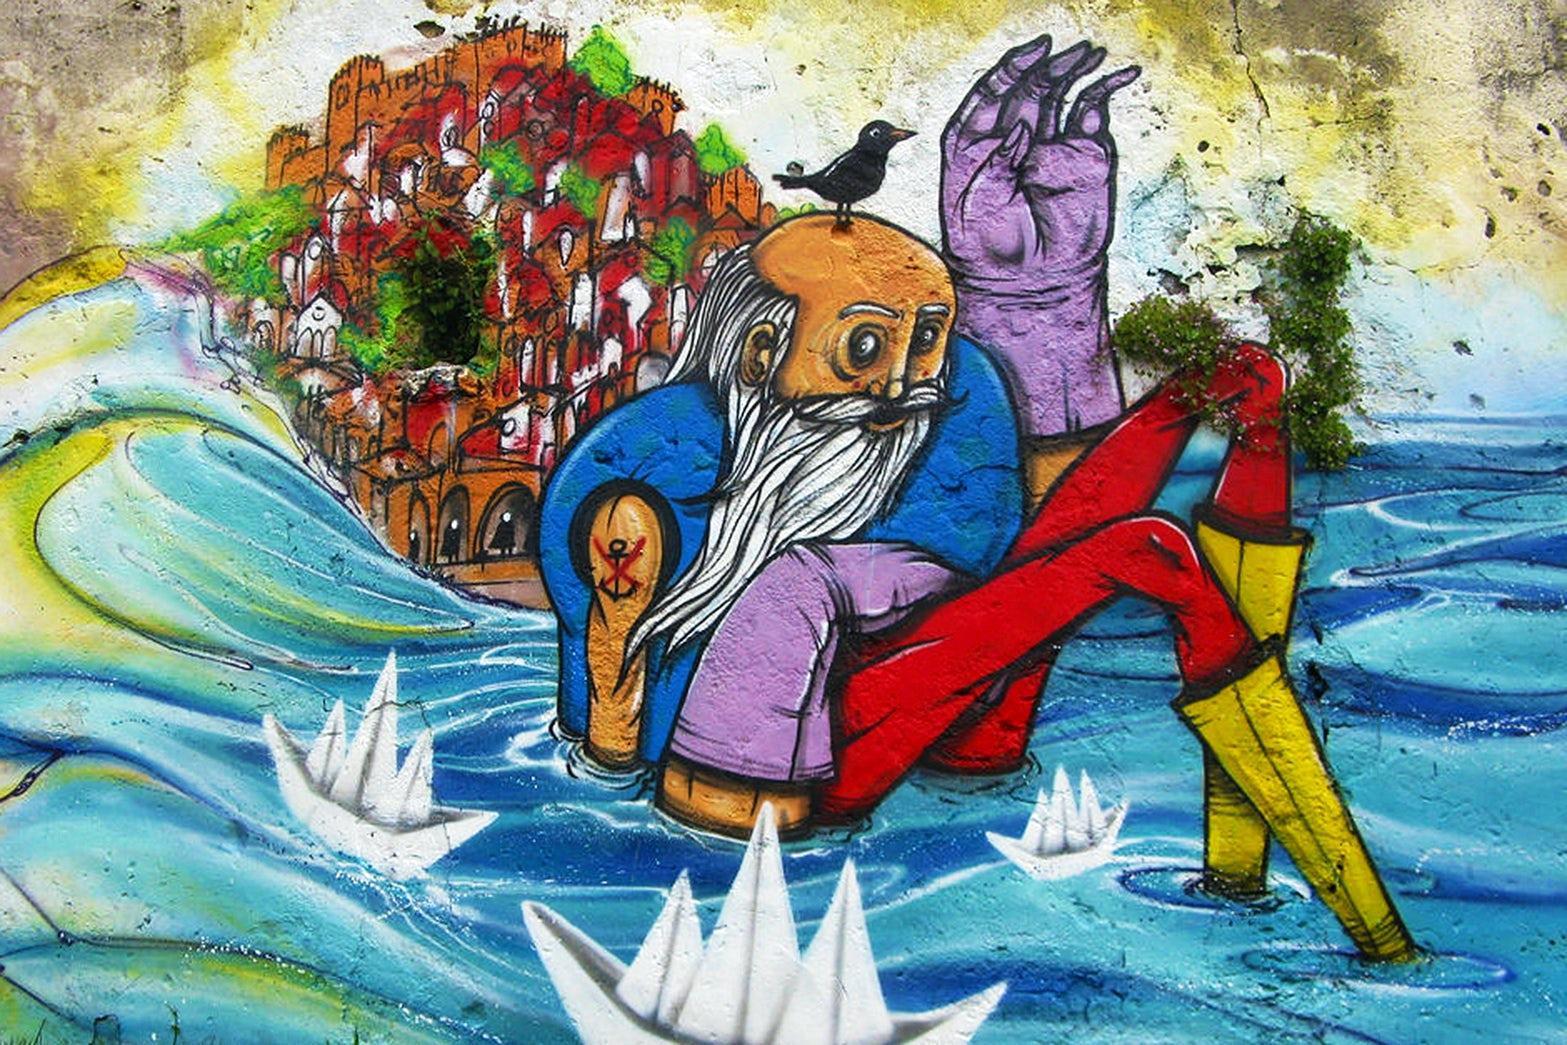 Urban Art in Lisboa 5: urban riverside